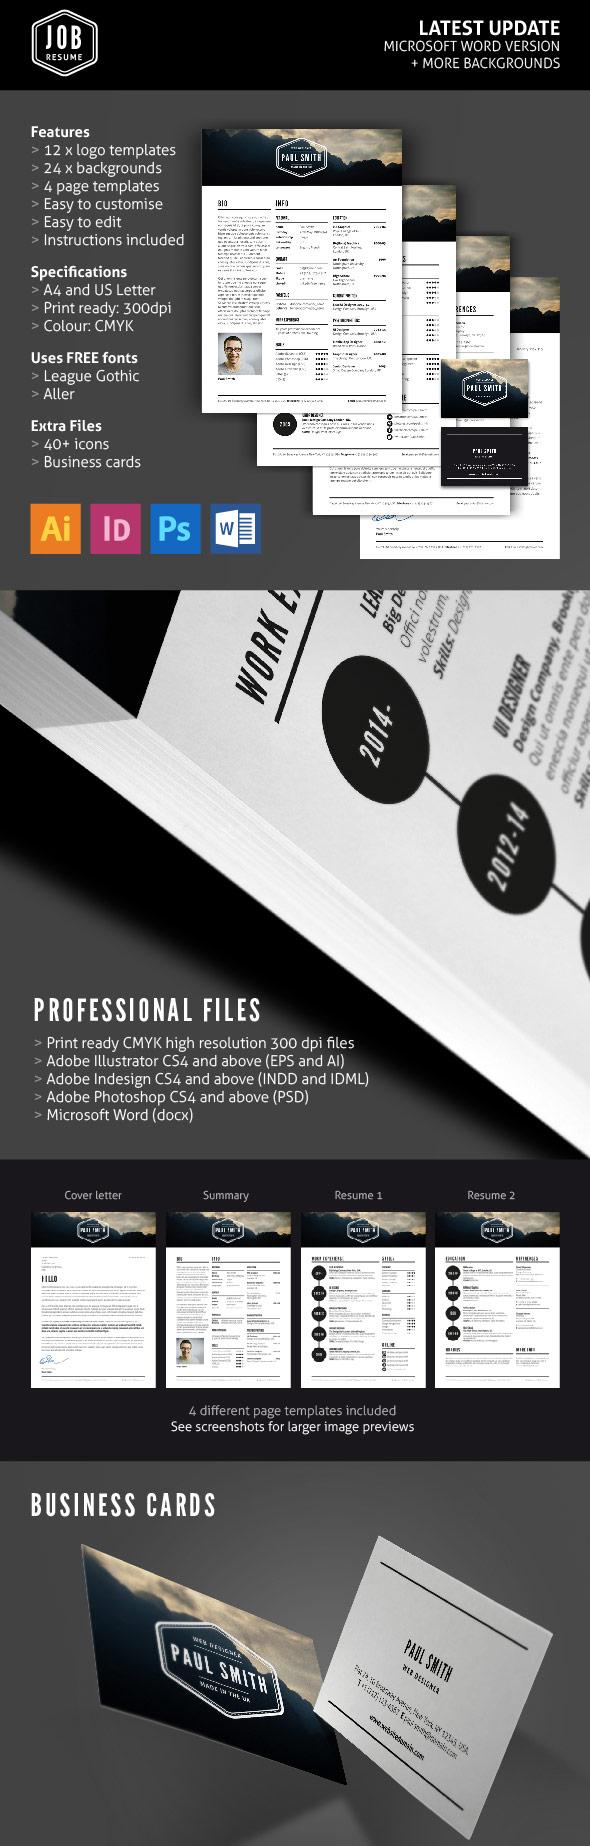 Job Resume Template Set (With Logos & Business Cards)